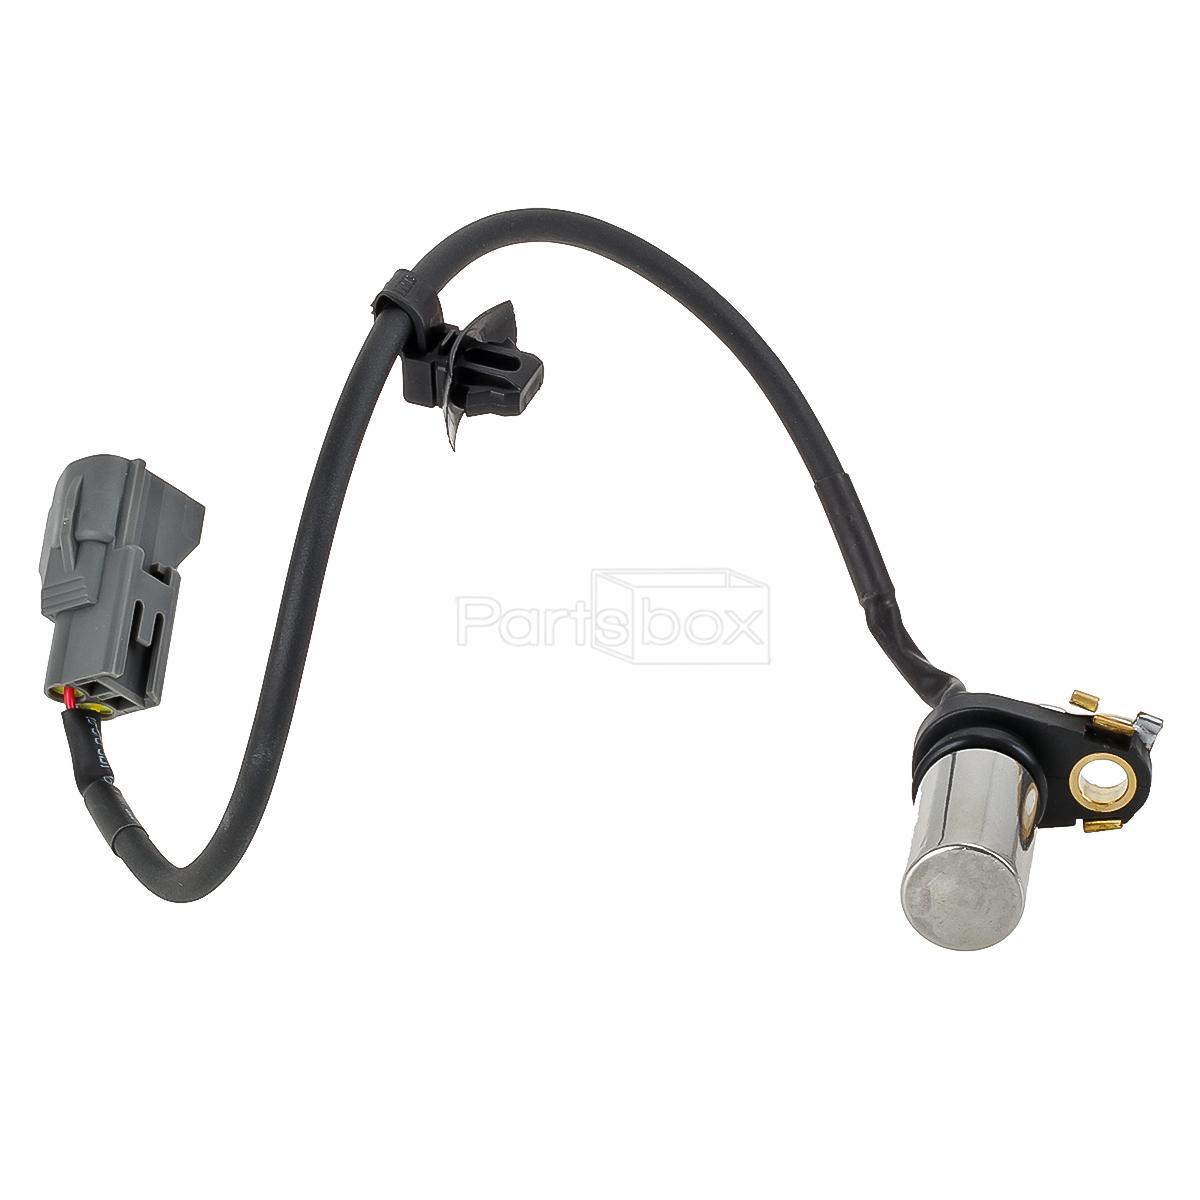 19185434  For 2002-2011 Toyota  Camry 1pc  Crankshaft  Position  Sensor  PC406